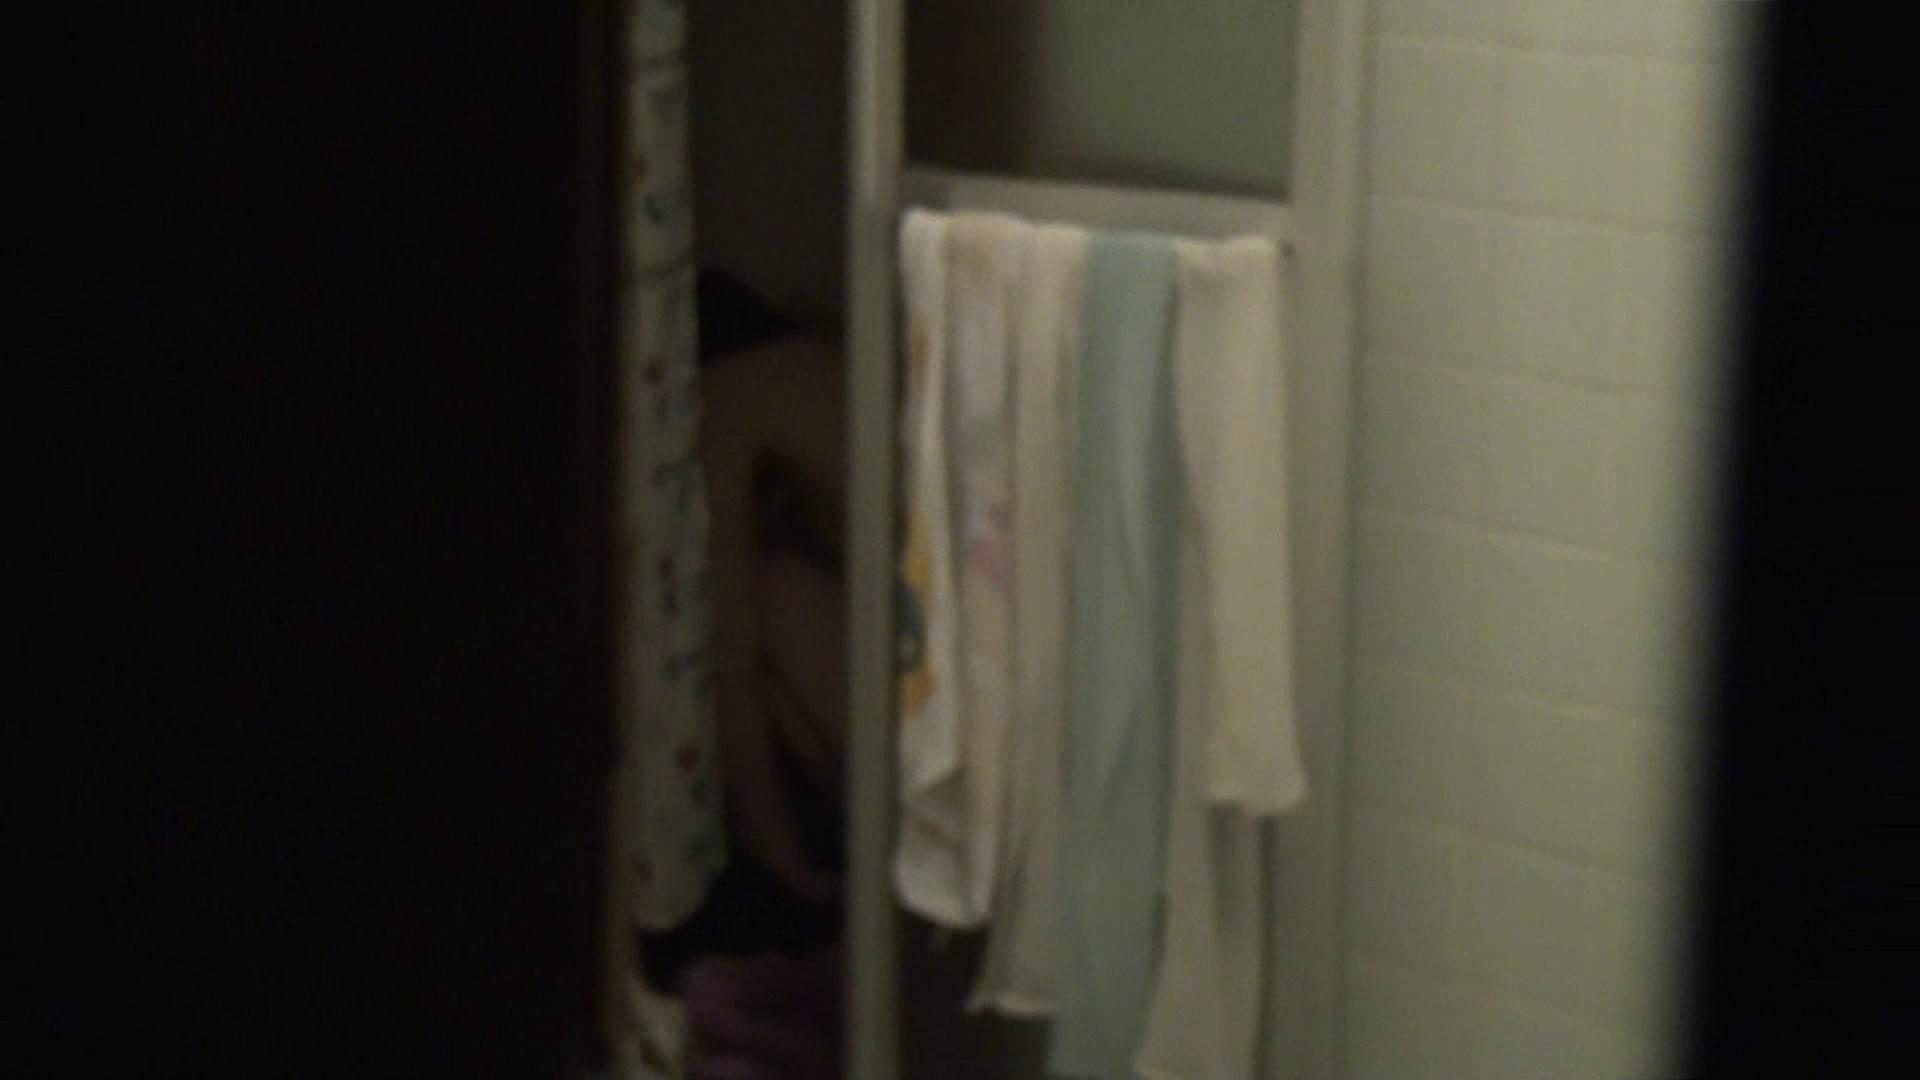 vol.06顔を洗い流す極上お女市さんの裸体をハイビジョンで!風呂上り着替え必見! お姉さん攻略 スケベ動画紹介 68画像 58